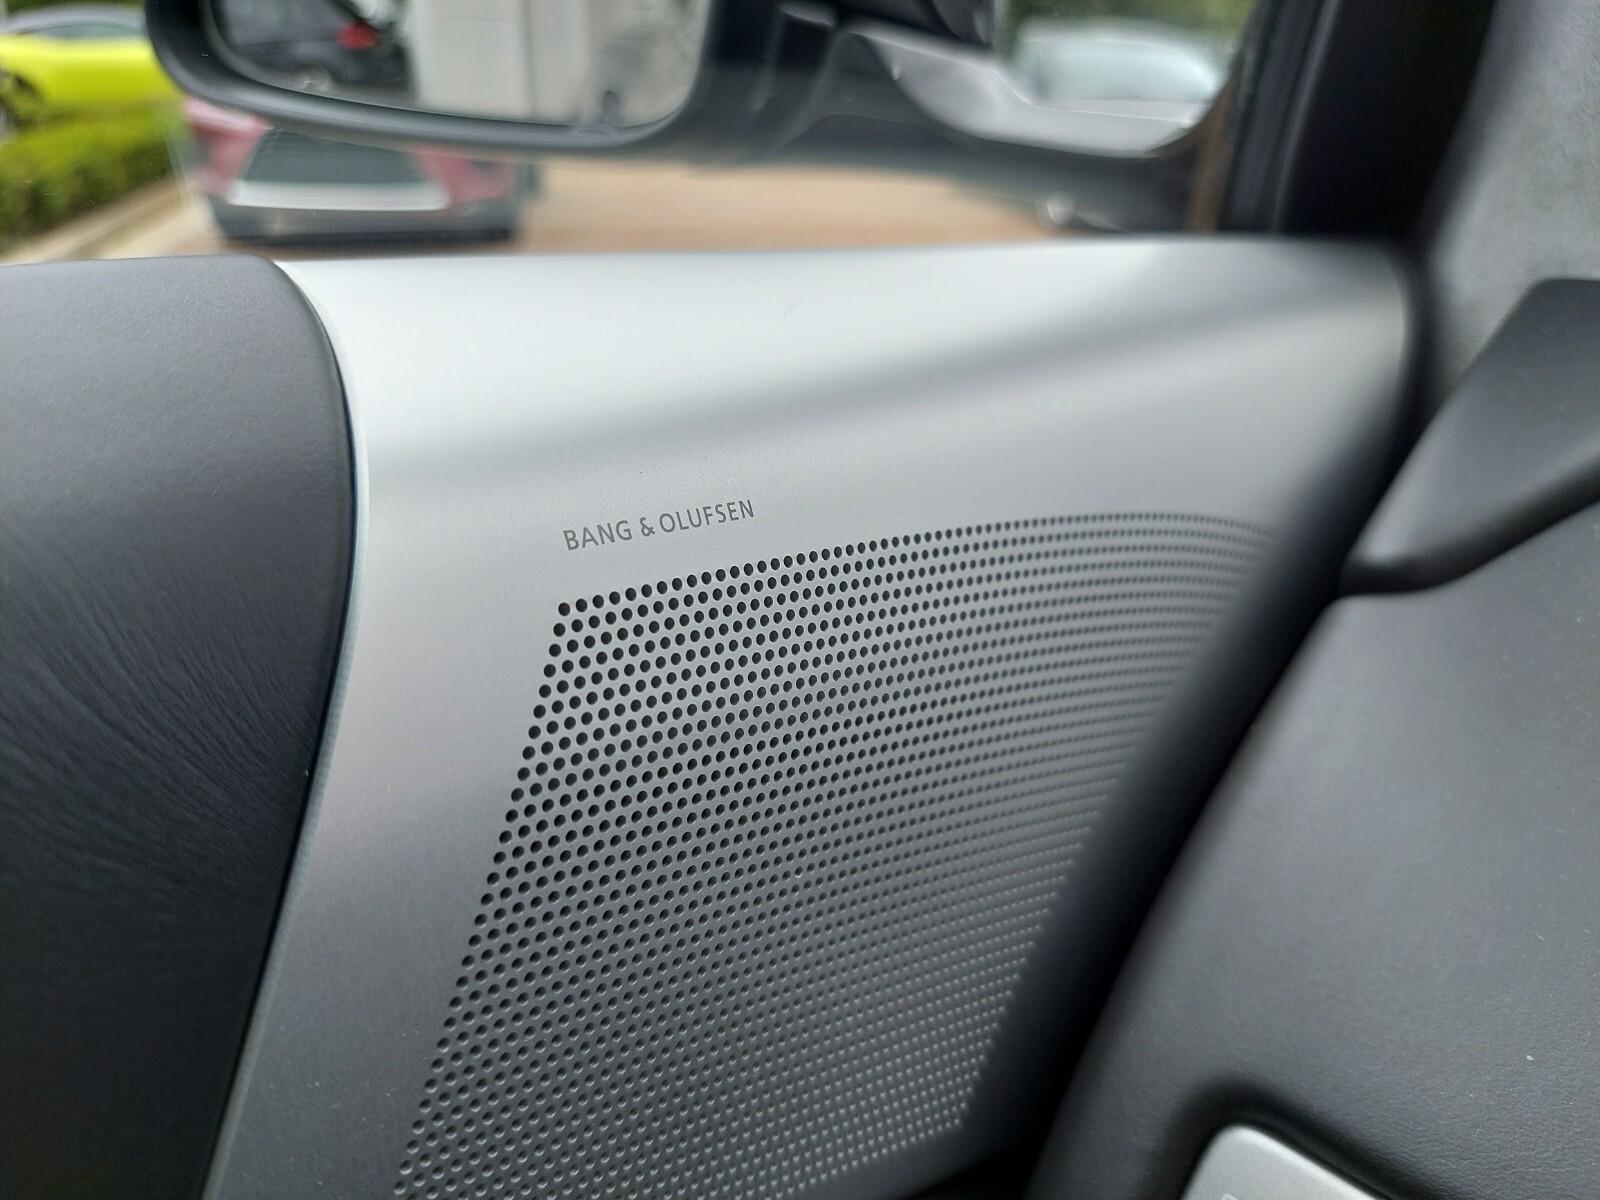 used car image